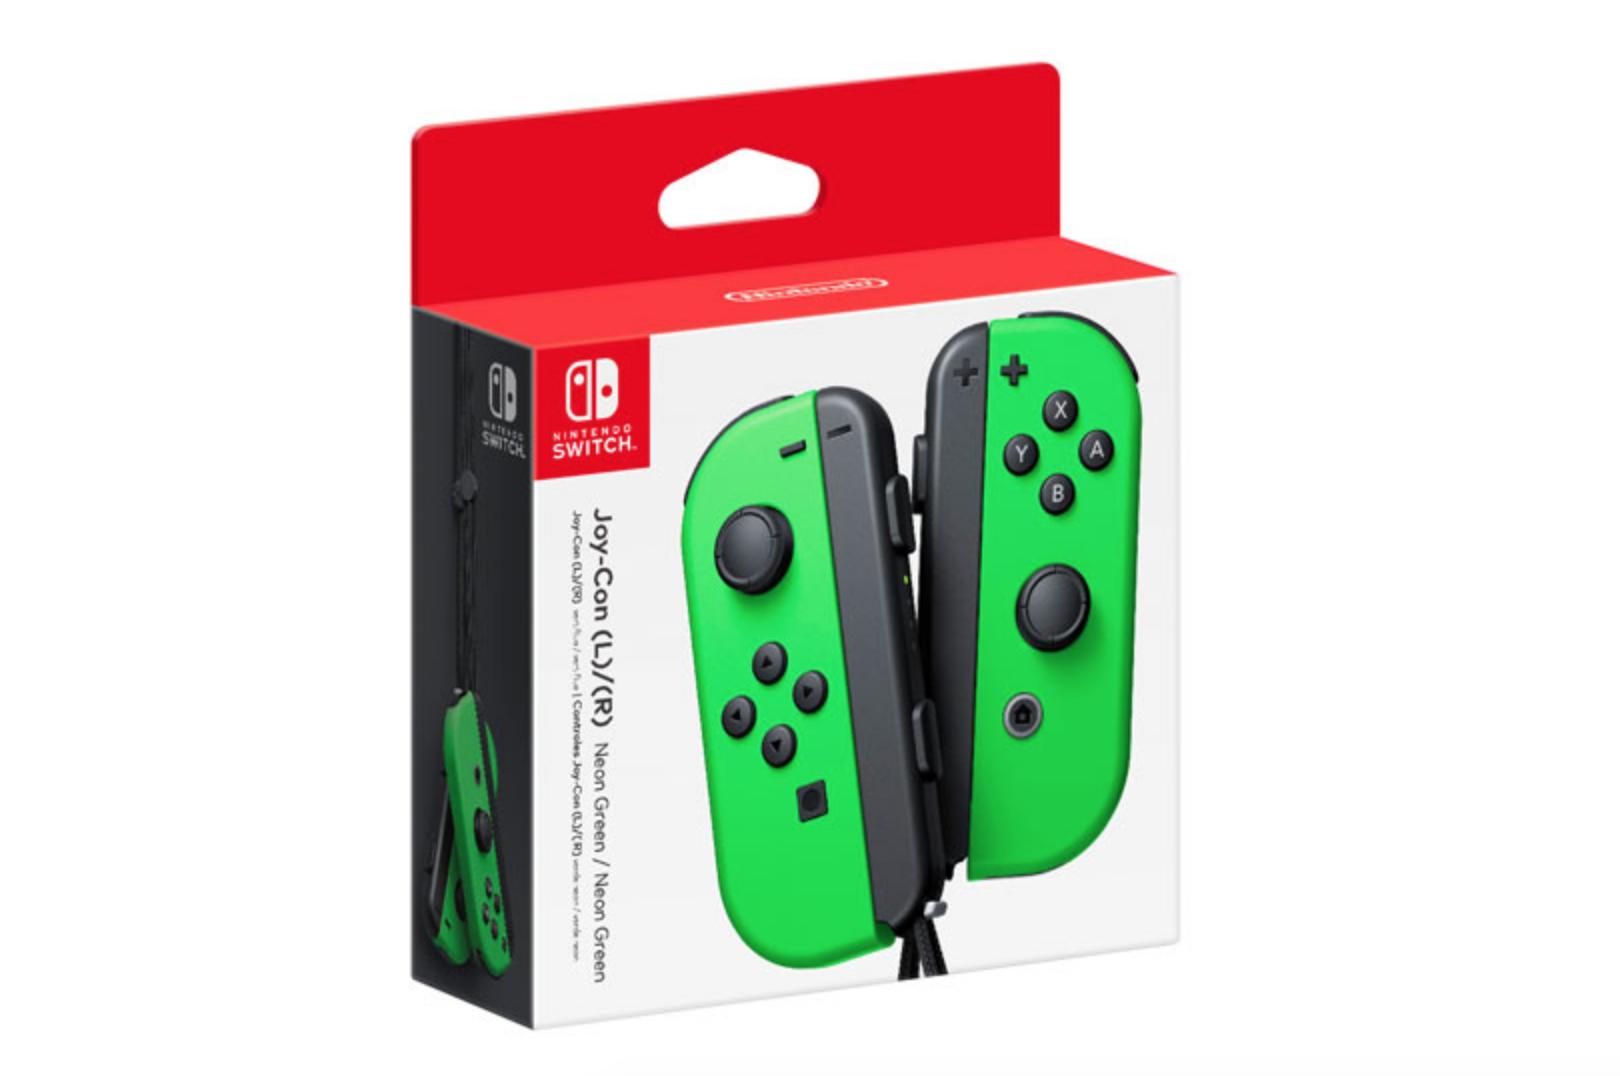 Best Buy Canada selling exclusive Neon Green Nintendo Switch Joy-Cons